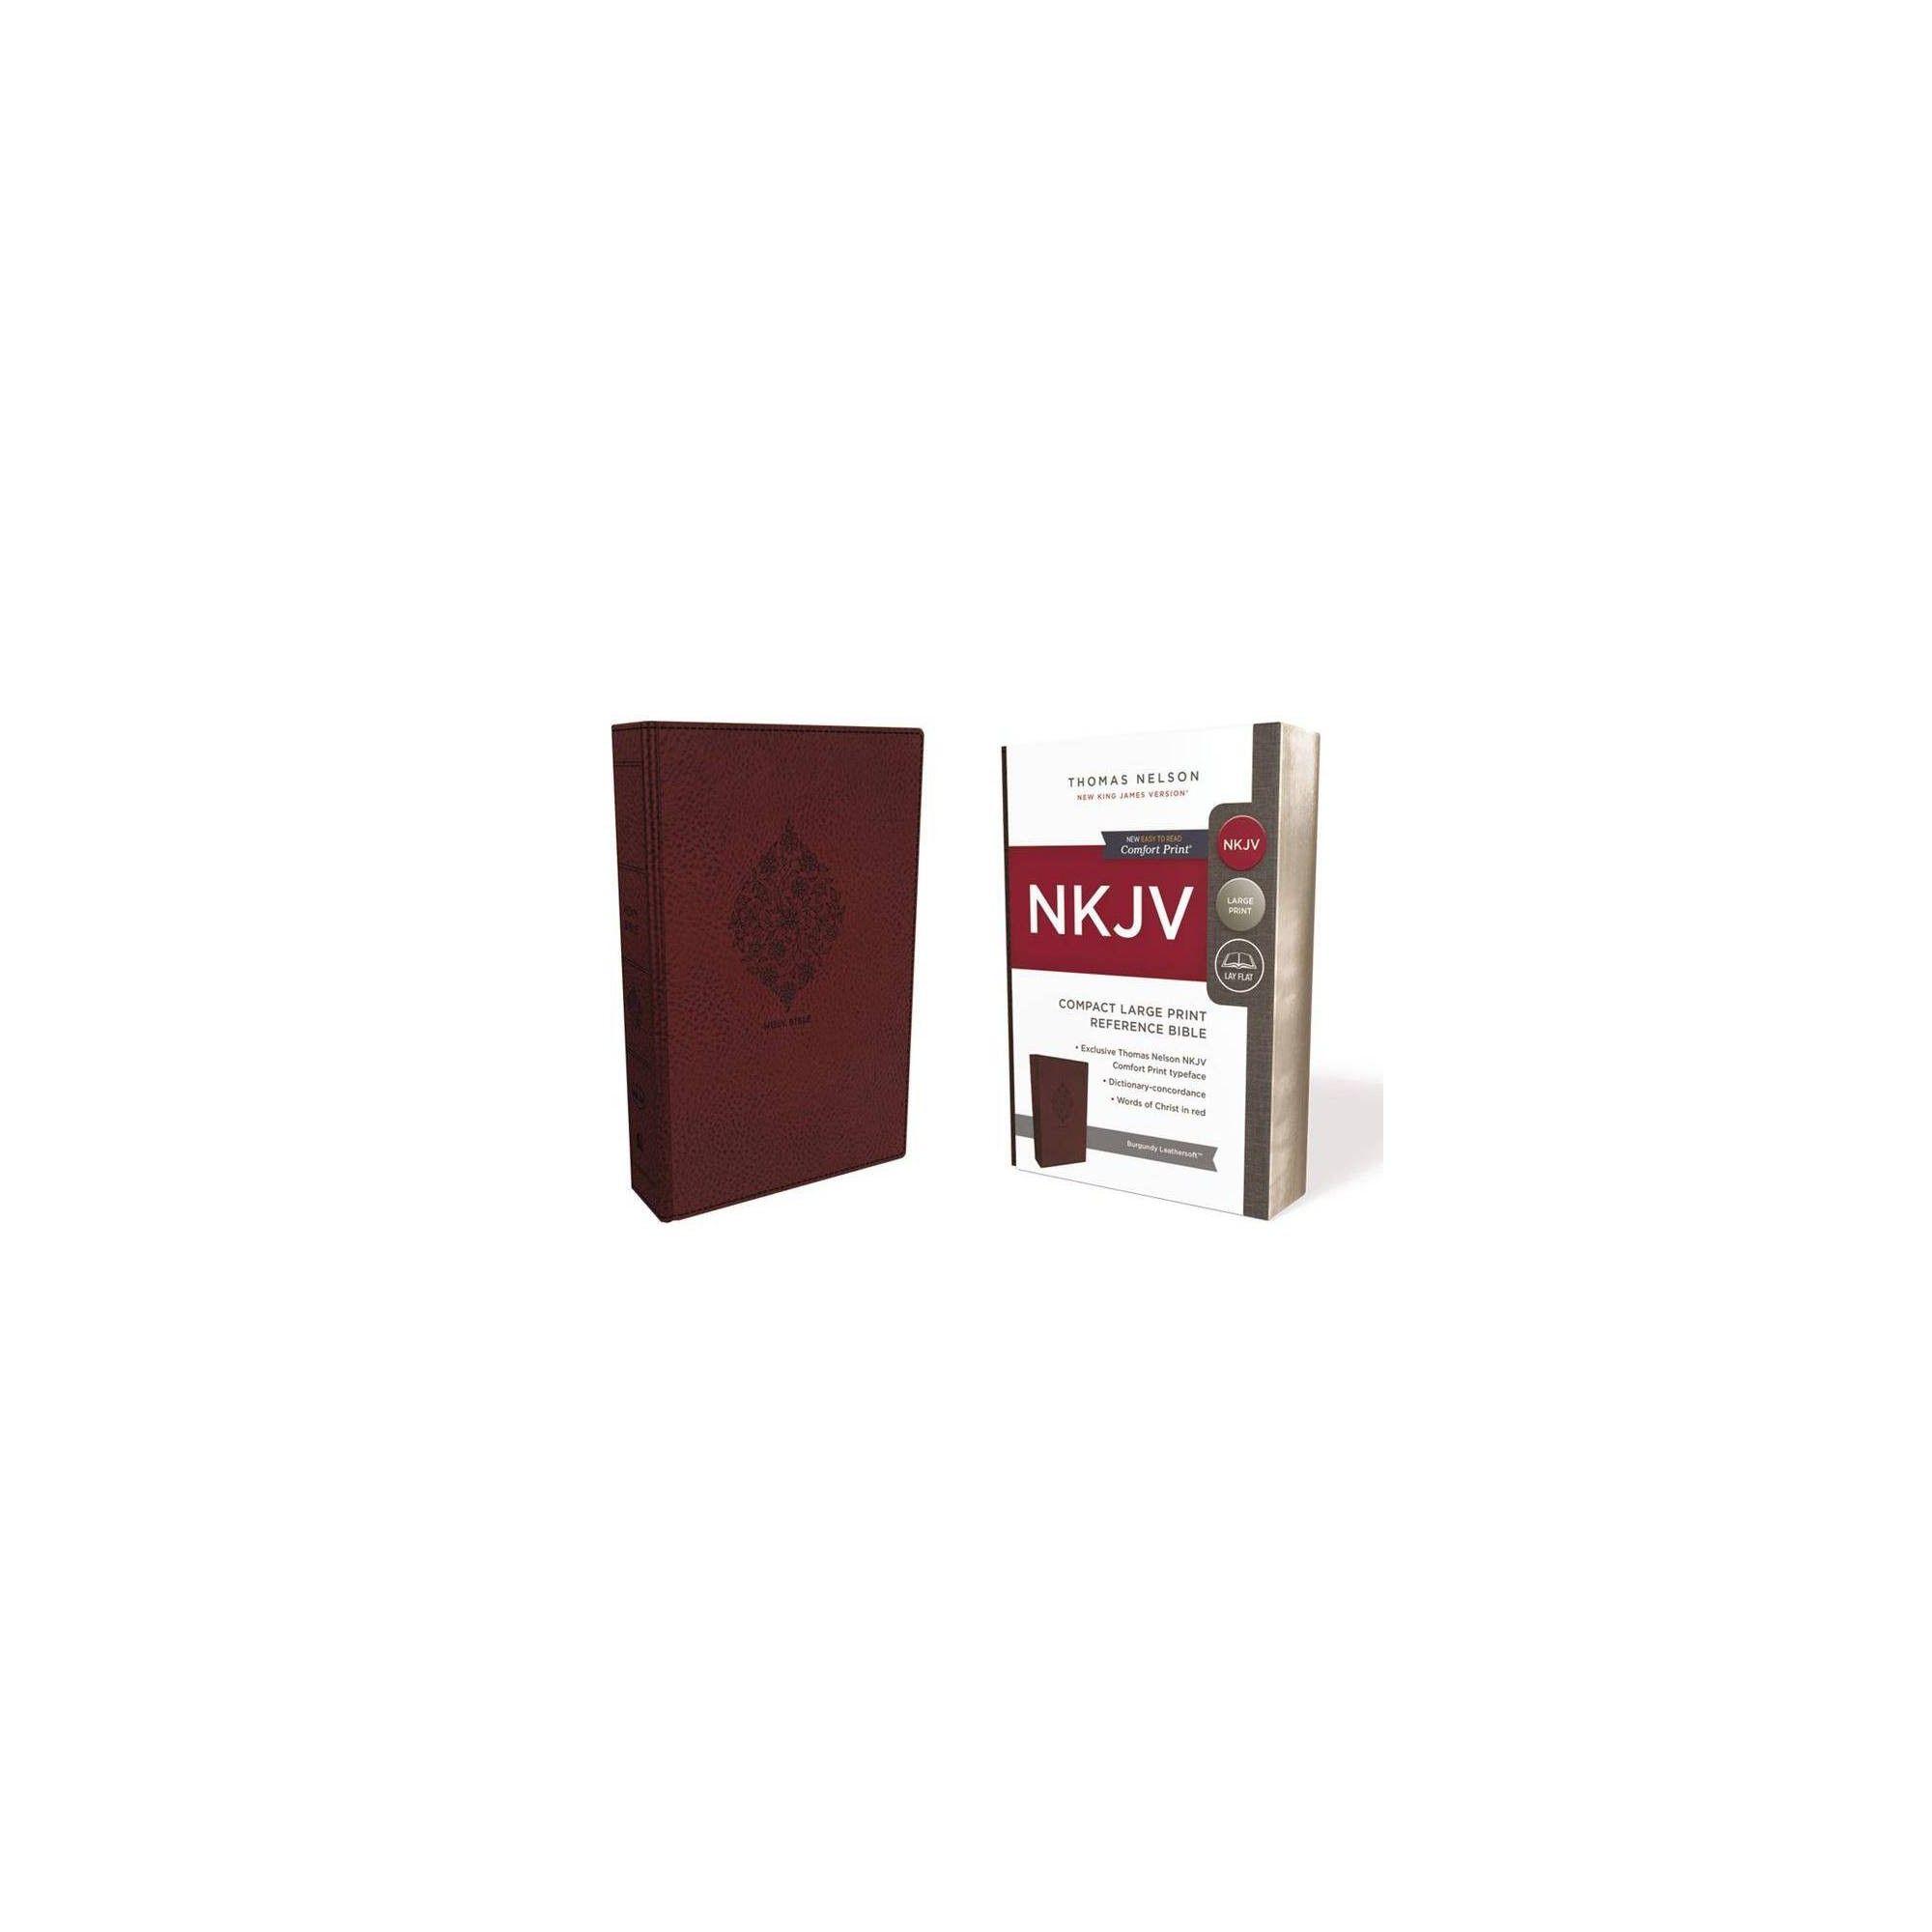 Nkjv Reference Bible Compact Large Print Imitation Leather